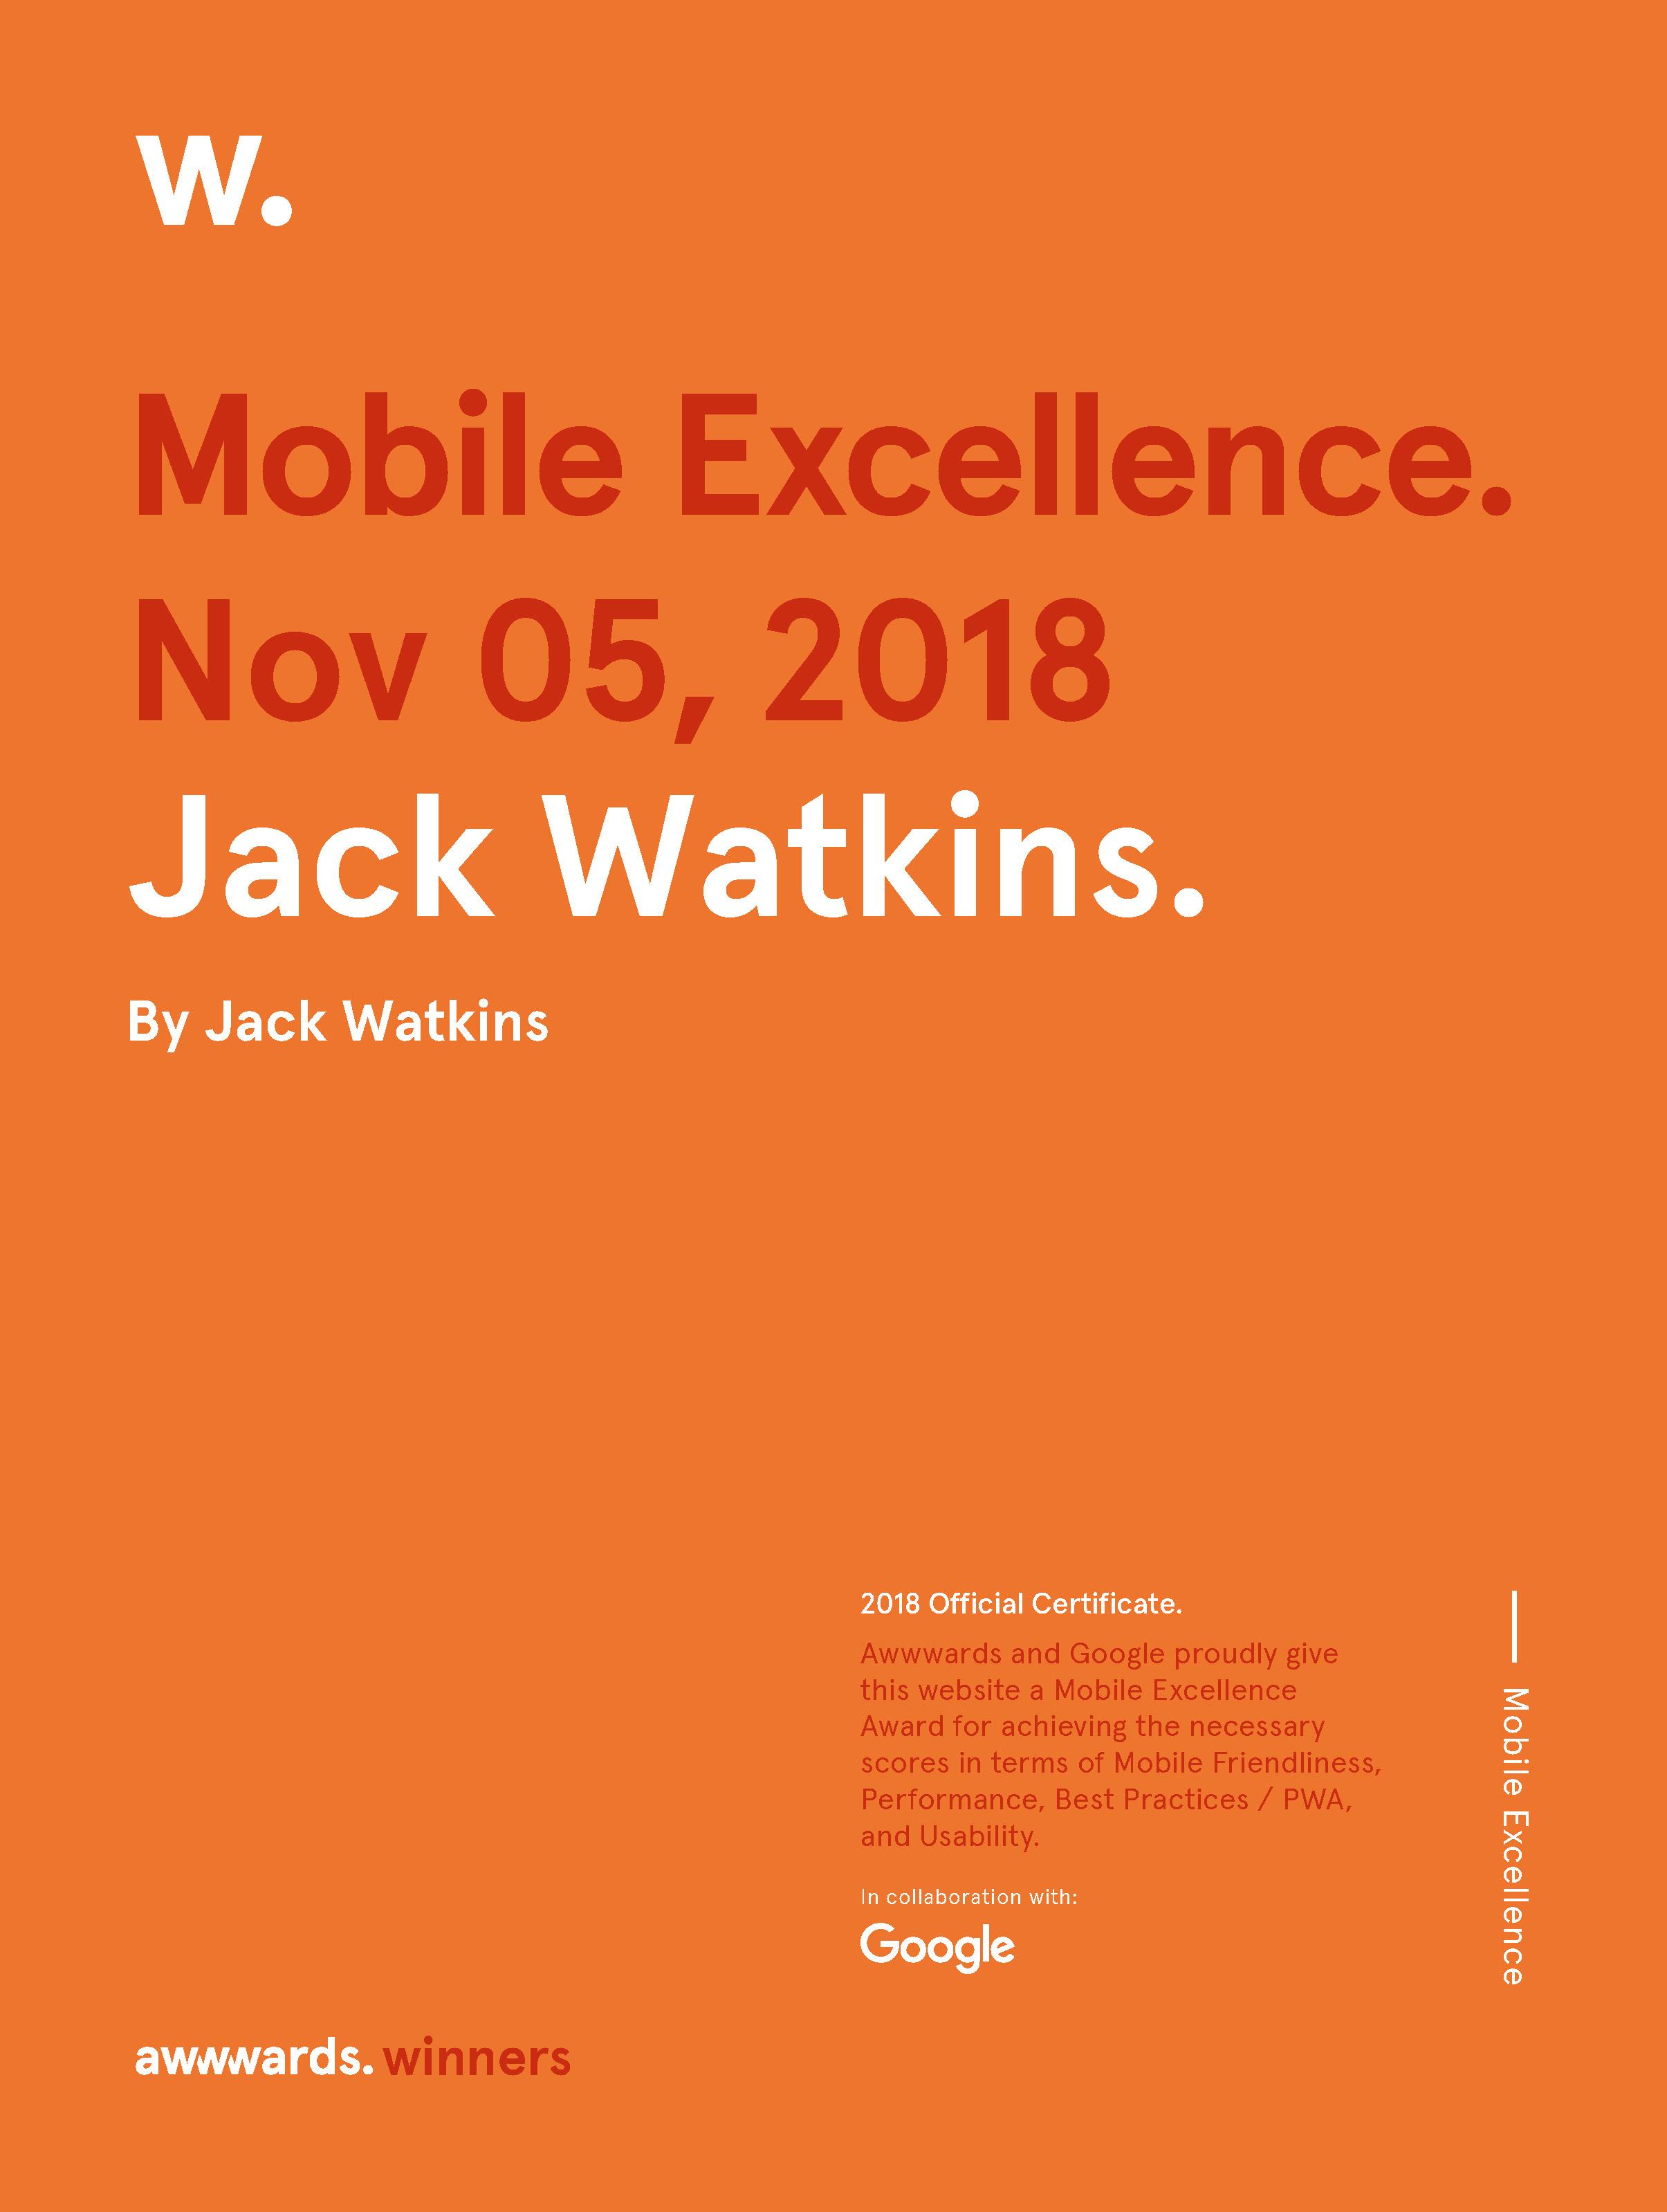 Jack Watkins Awwwards Mobile Excellence Award